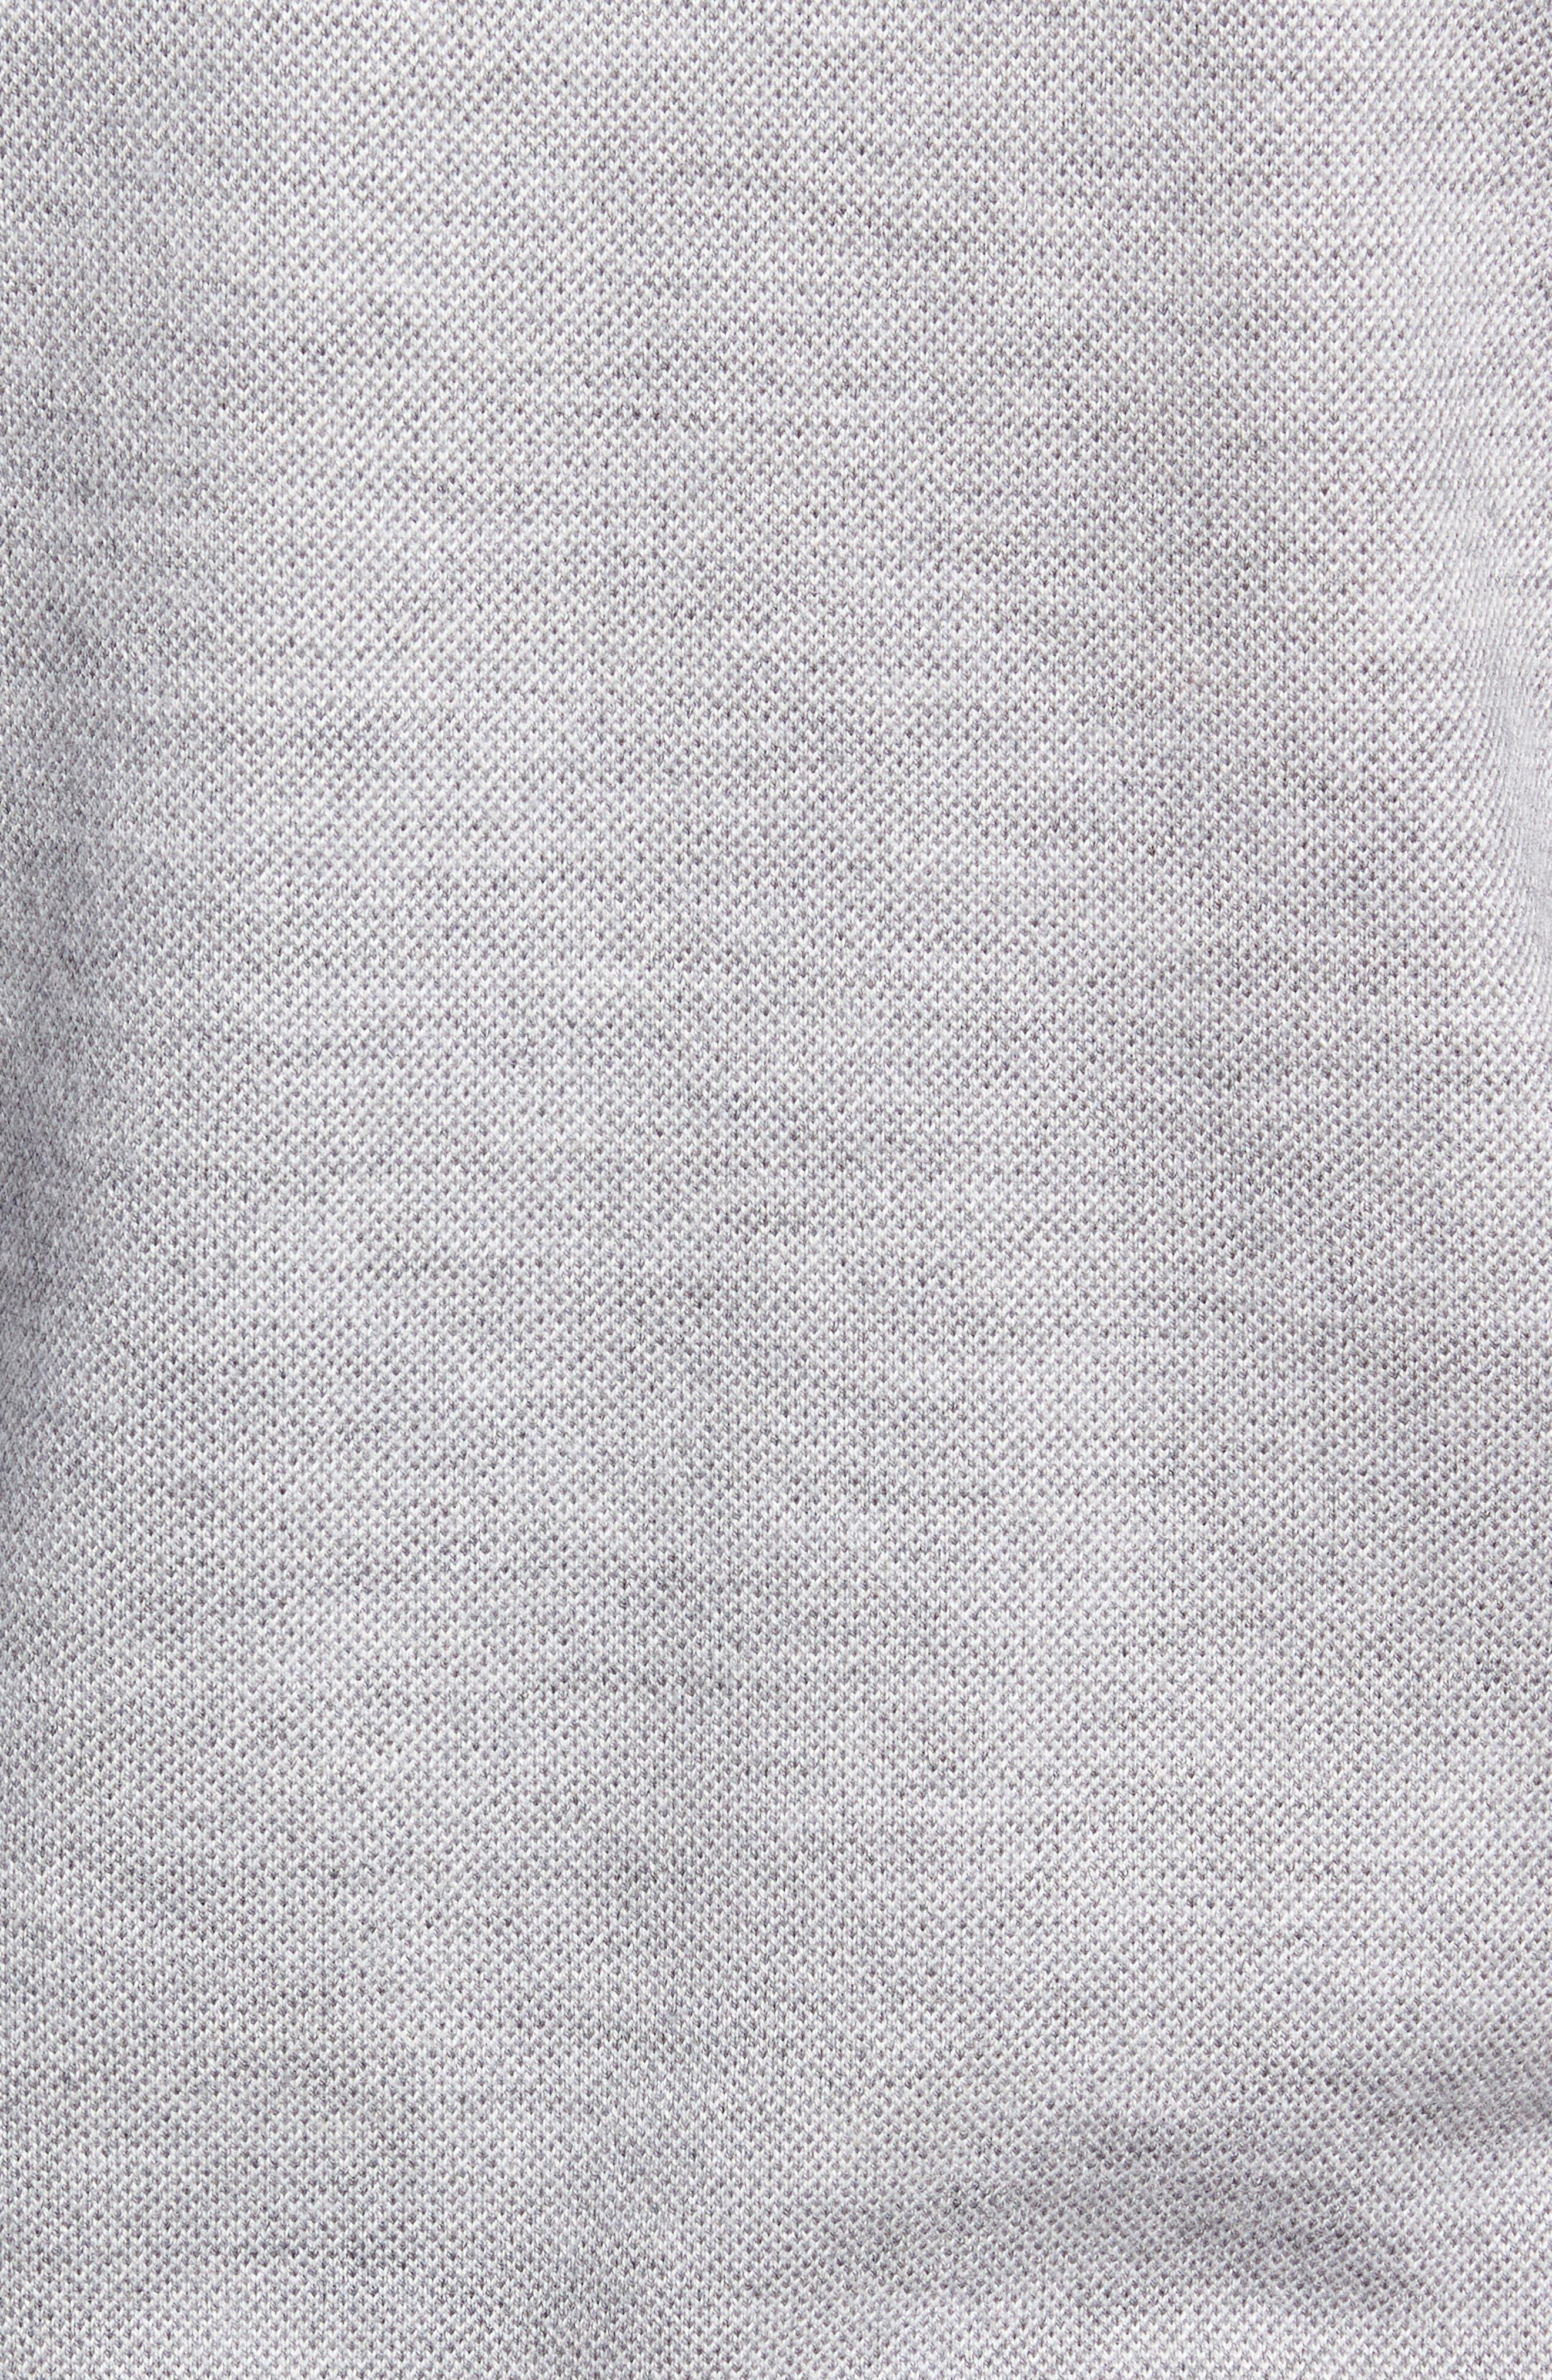 Birdseye Merino Wool Quarter Zip Sweater,                             Alternate thumbnail 5, color,                             BRITISH GREY